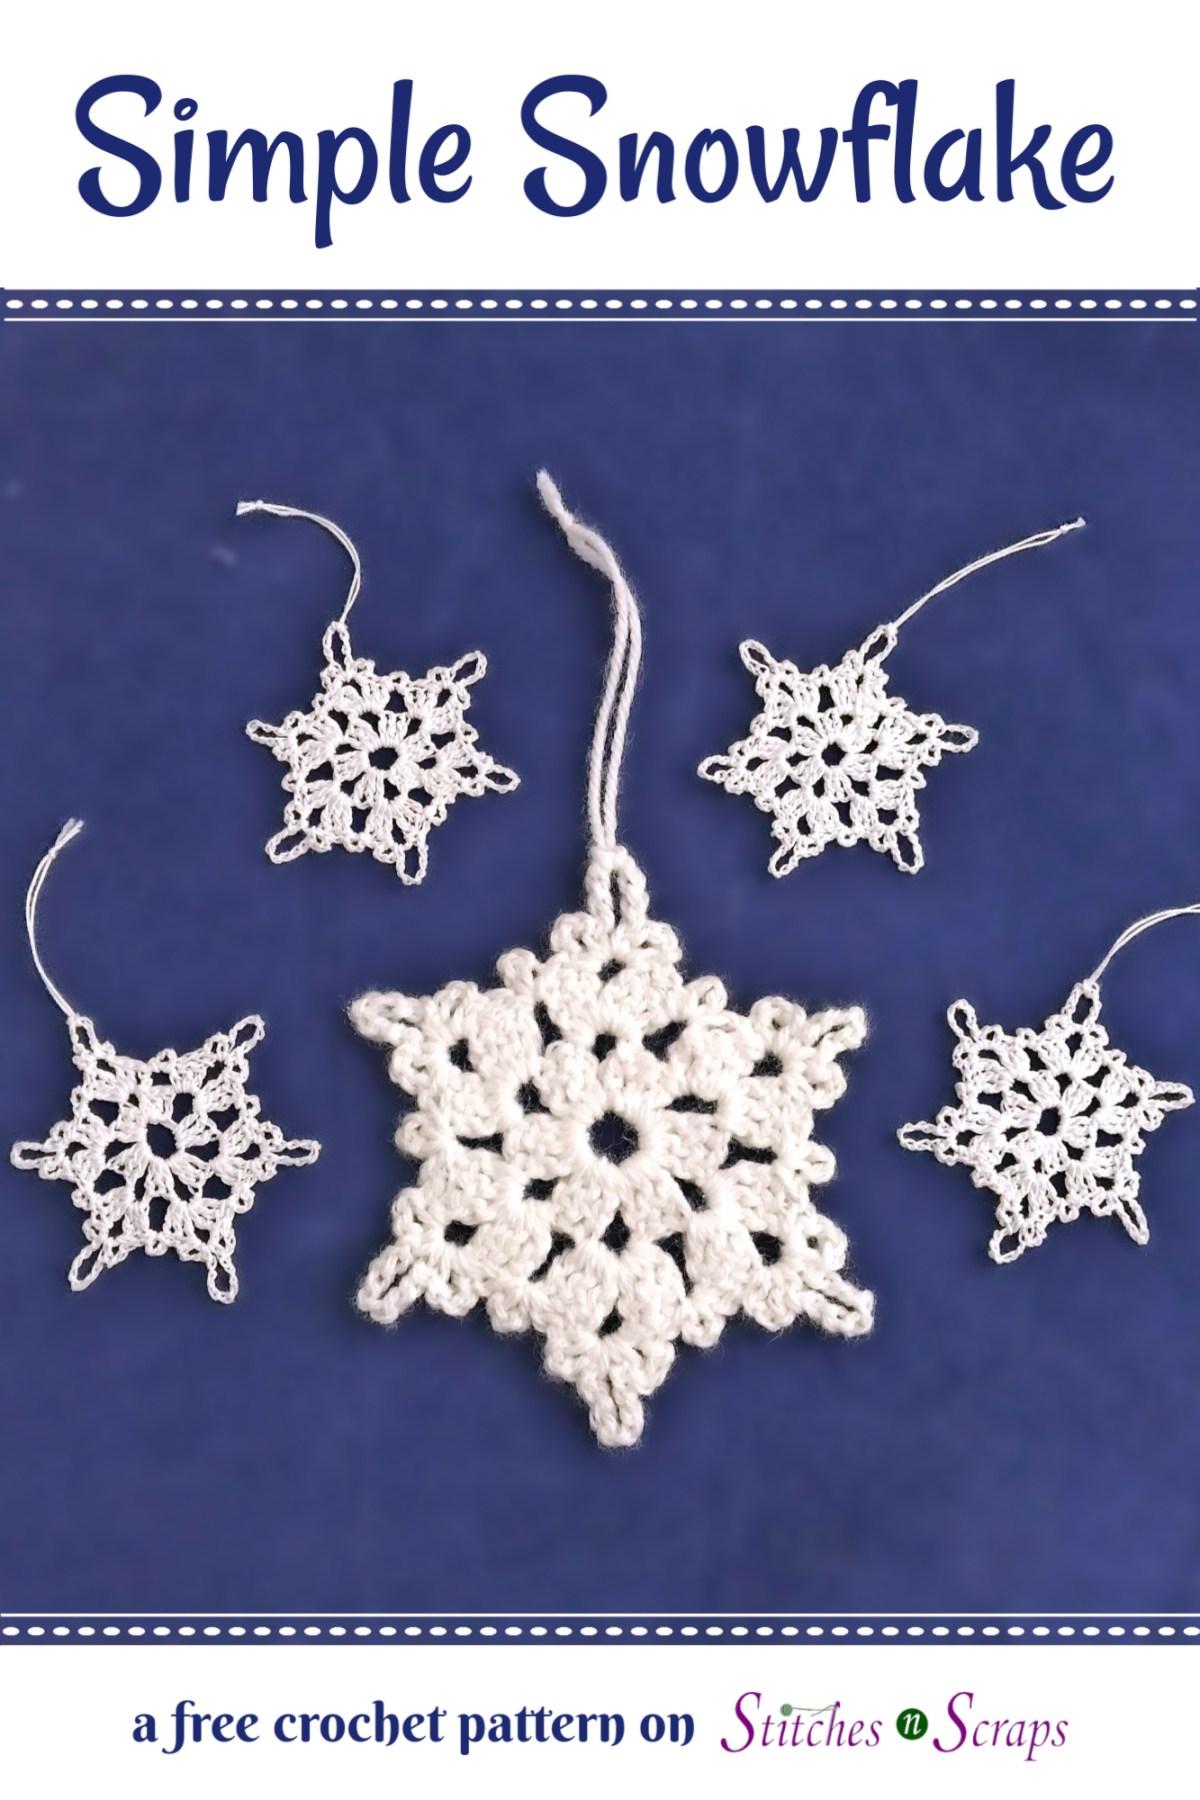 Free Pattern Simple Snowflake Stitches N Scraps